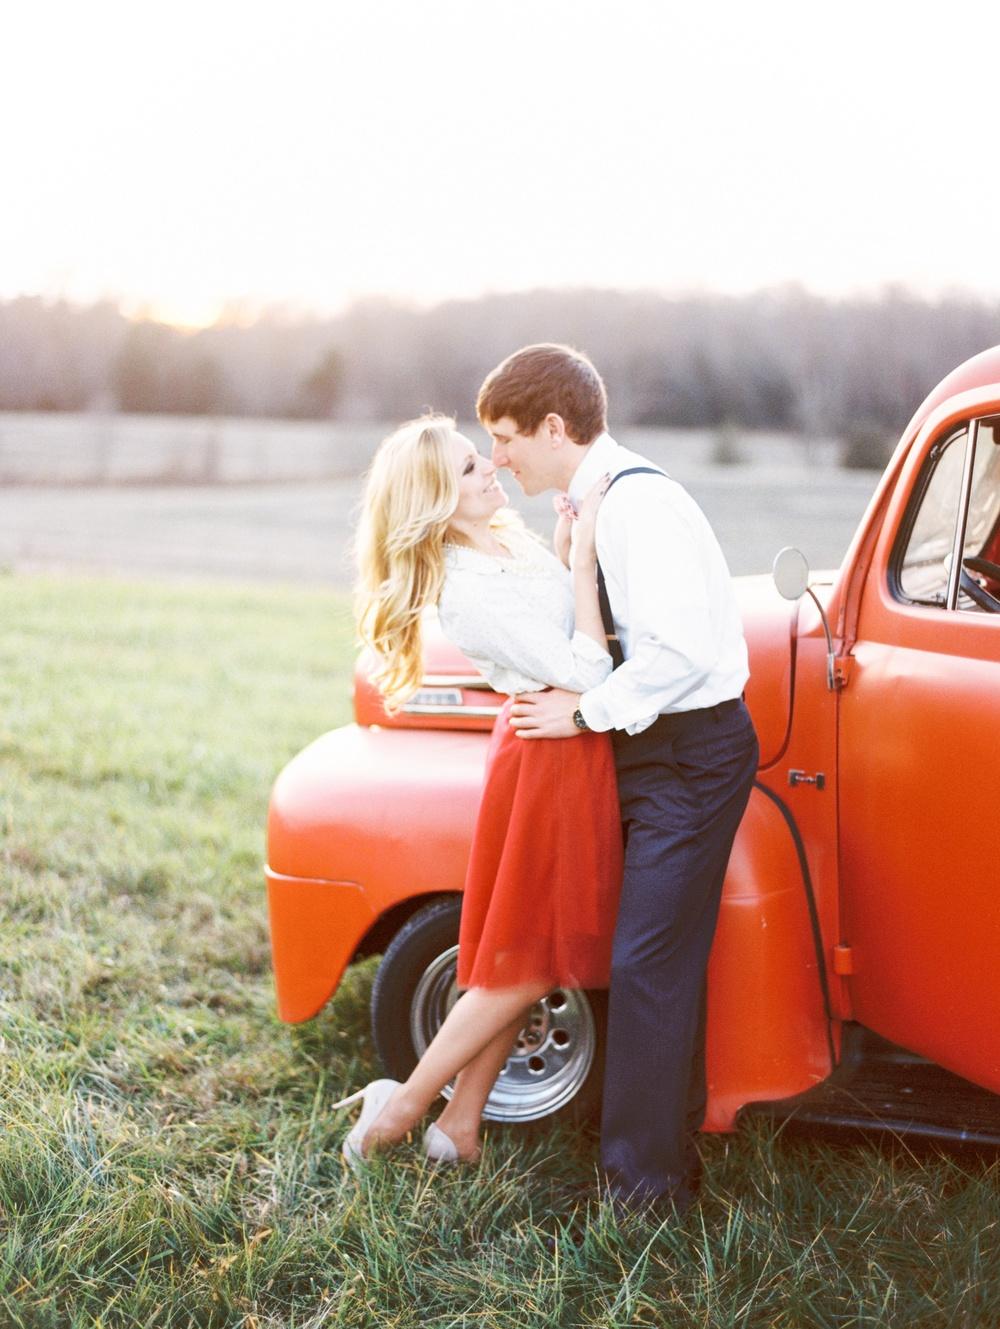 Fredericksburg_wedding_photographer_romantic_vintage_engagement_Natalie_Jayne_moore_engaged_image